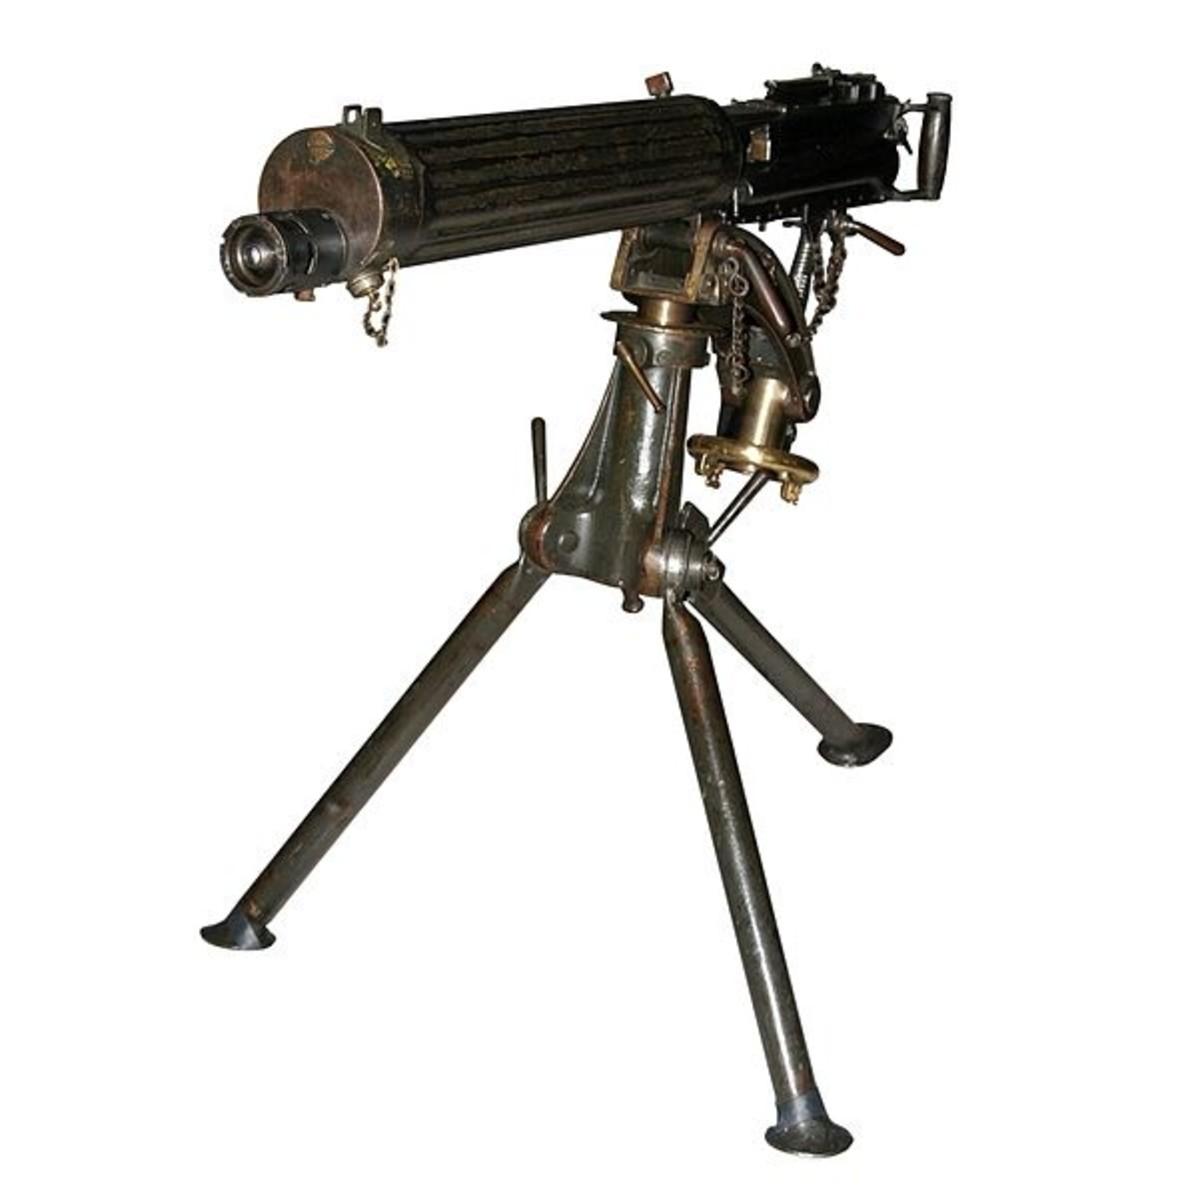 World War Two (WWII) Vickers machine-gun.